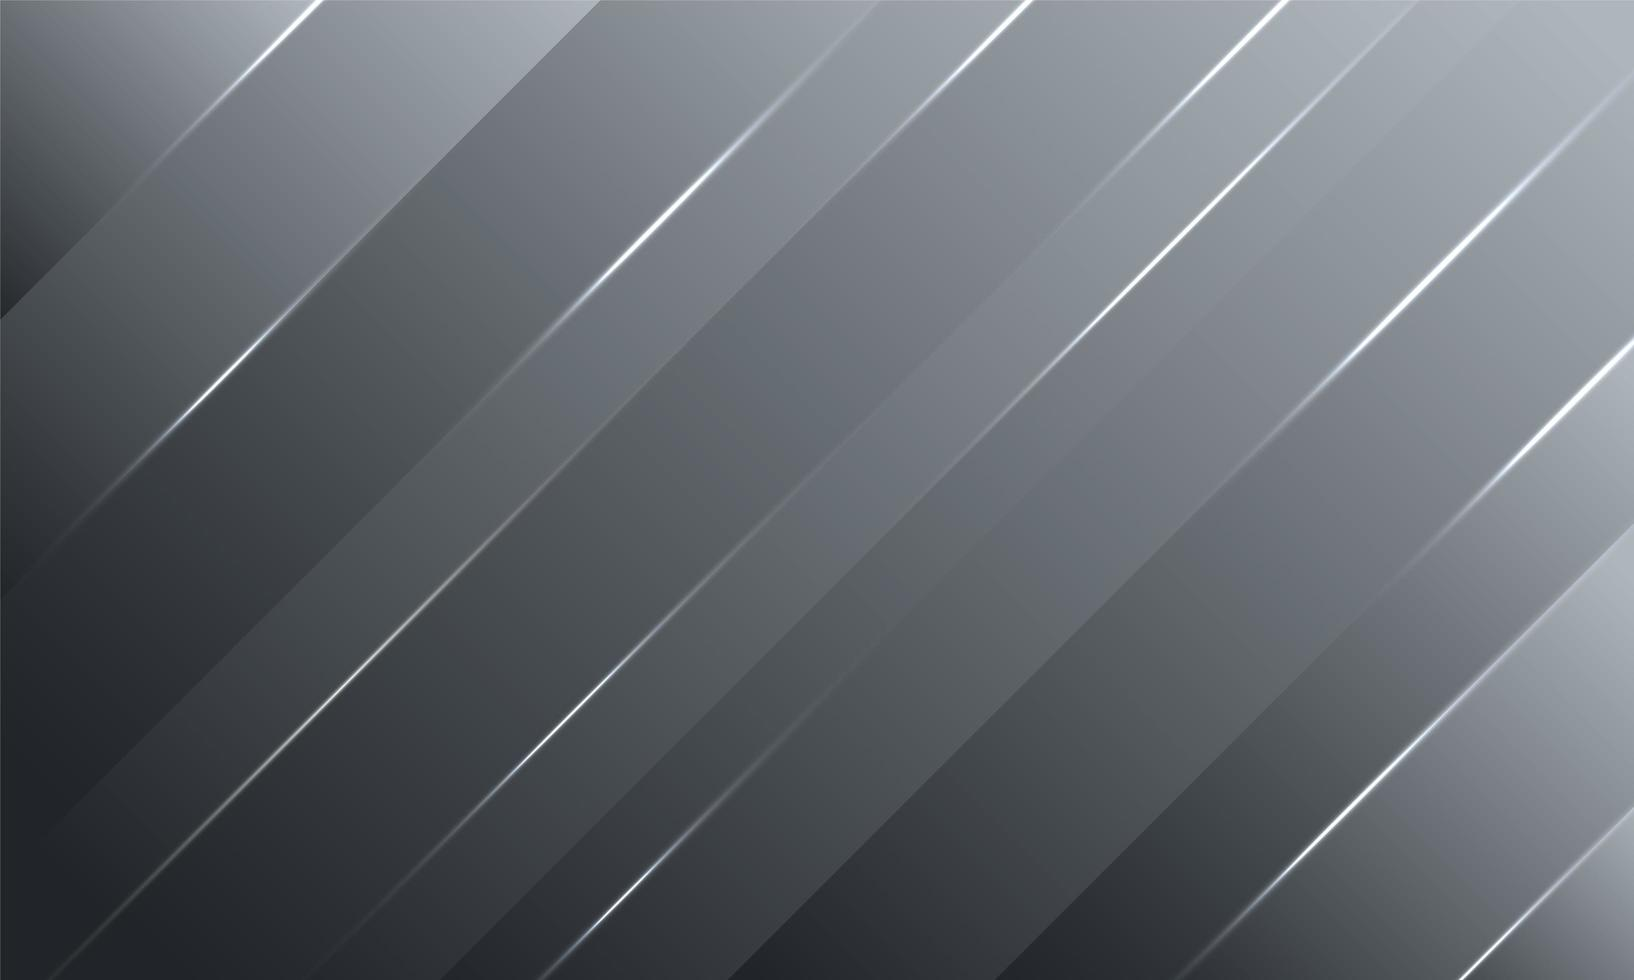 donkere gradiëntstrepenachtergrond met glanzende lichte lijnen vector